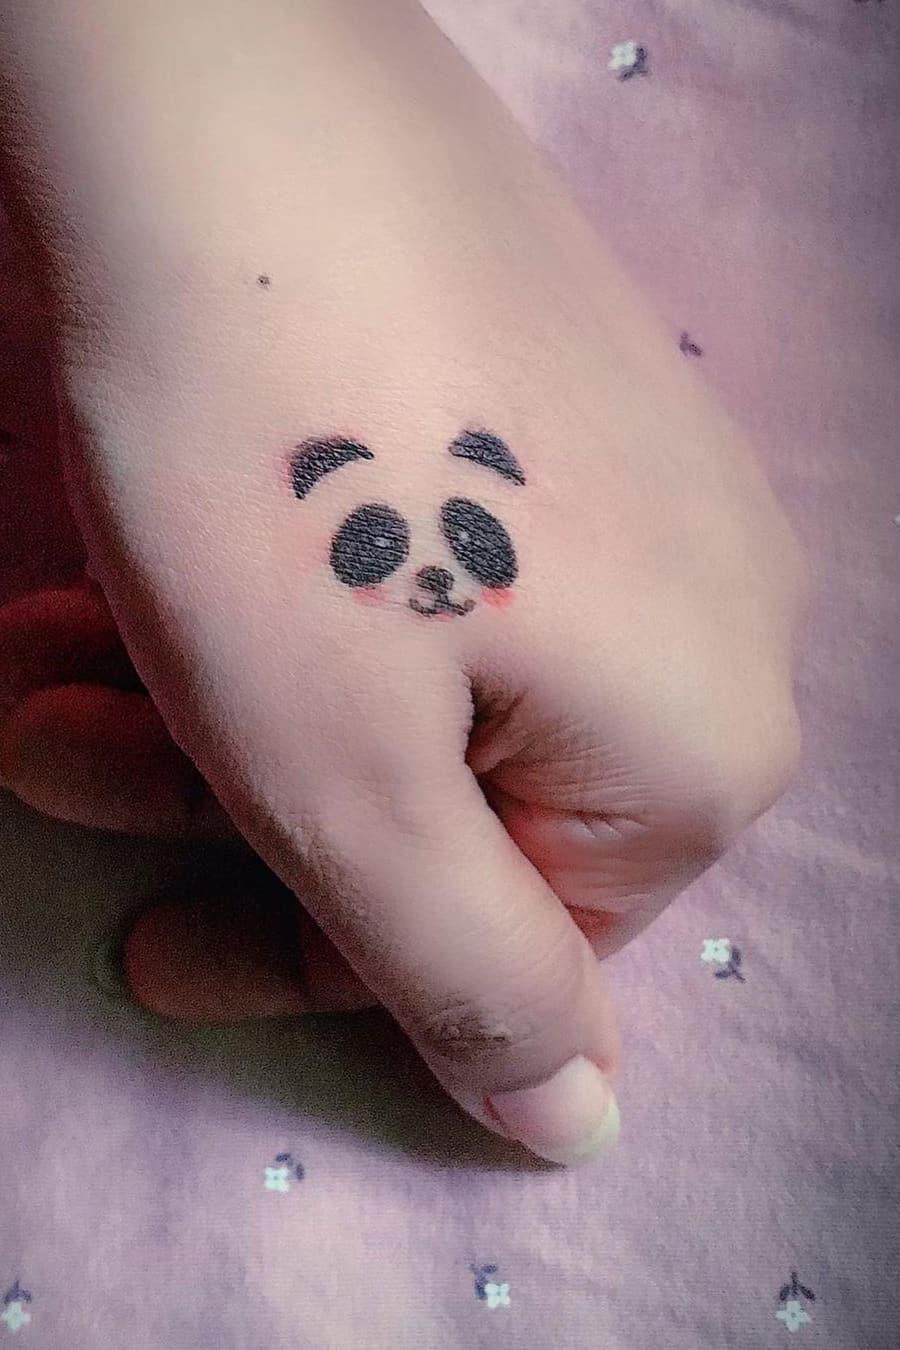 Panda tattoo on hand